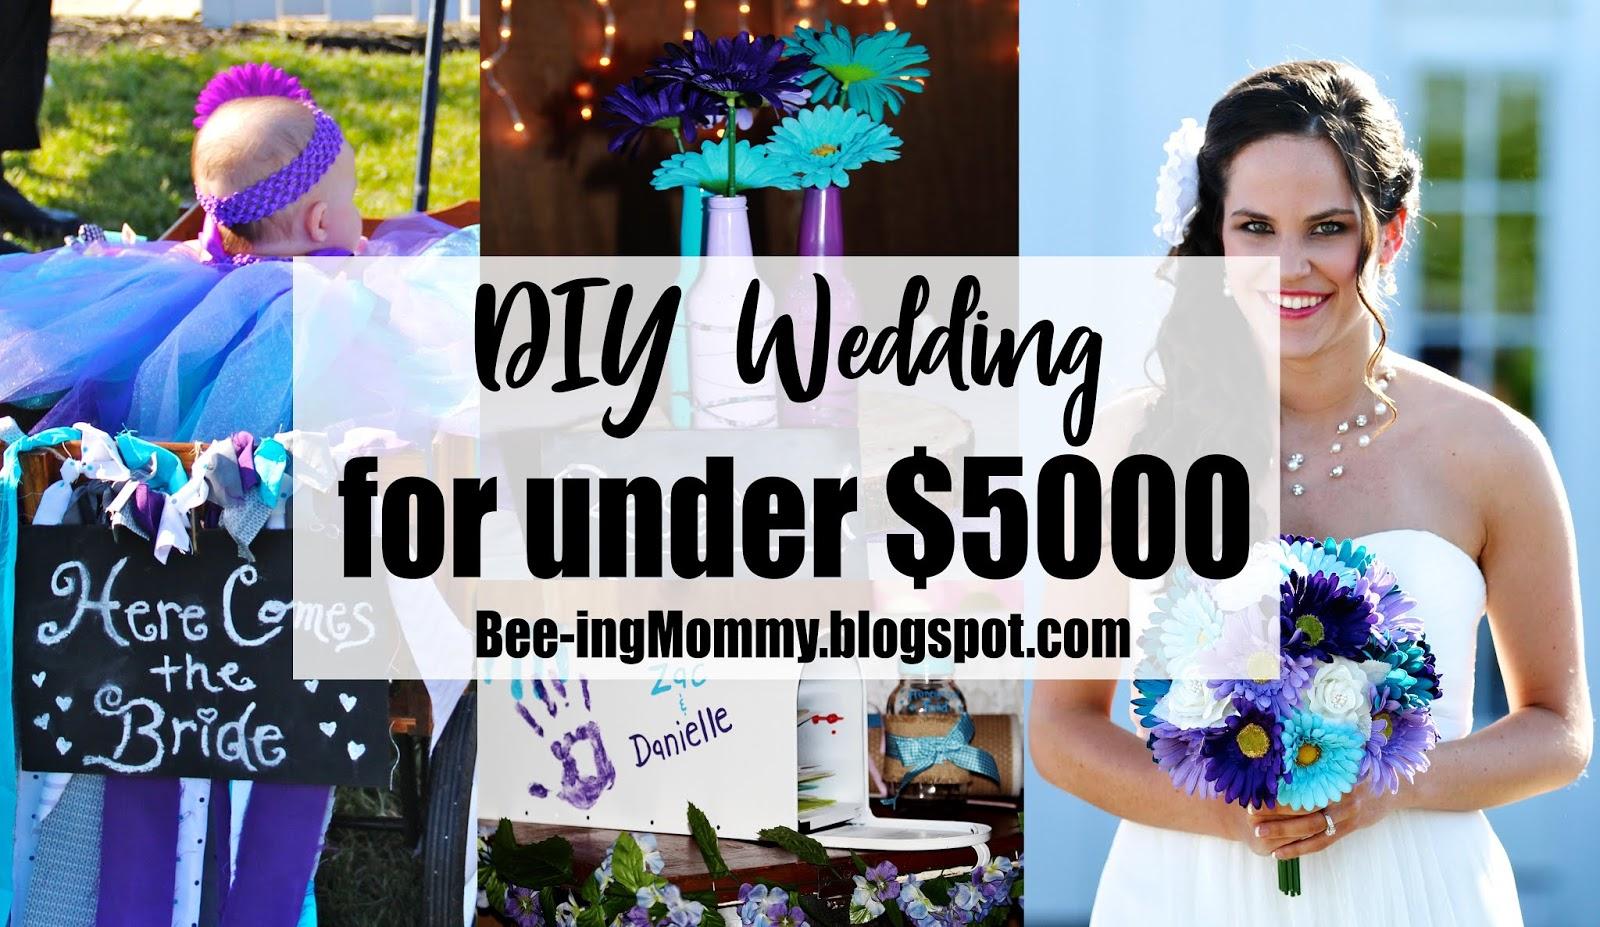 DIY Rustic Wedding for under $5000